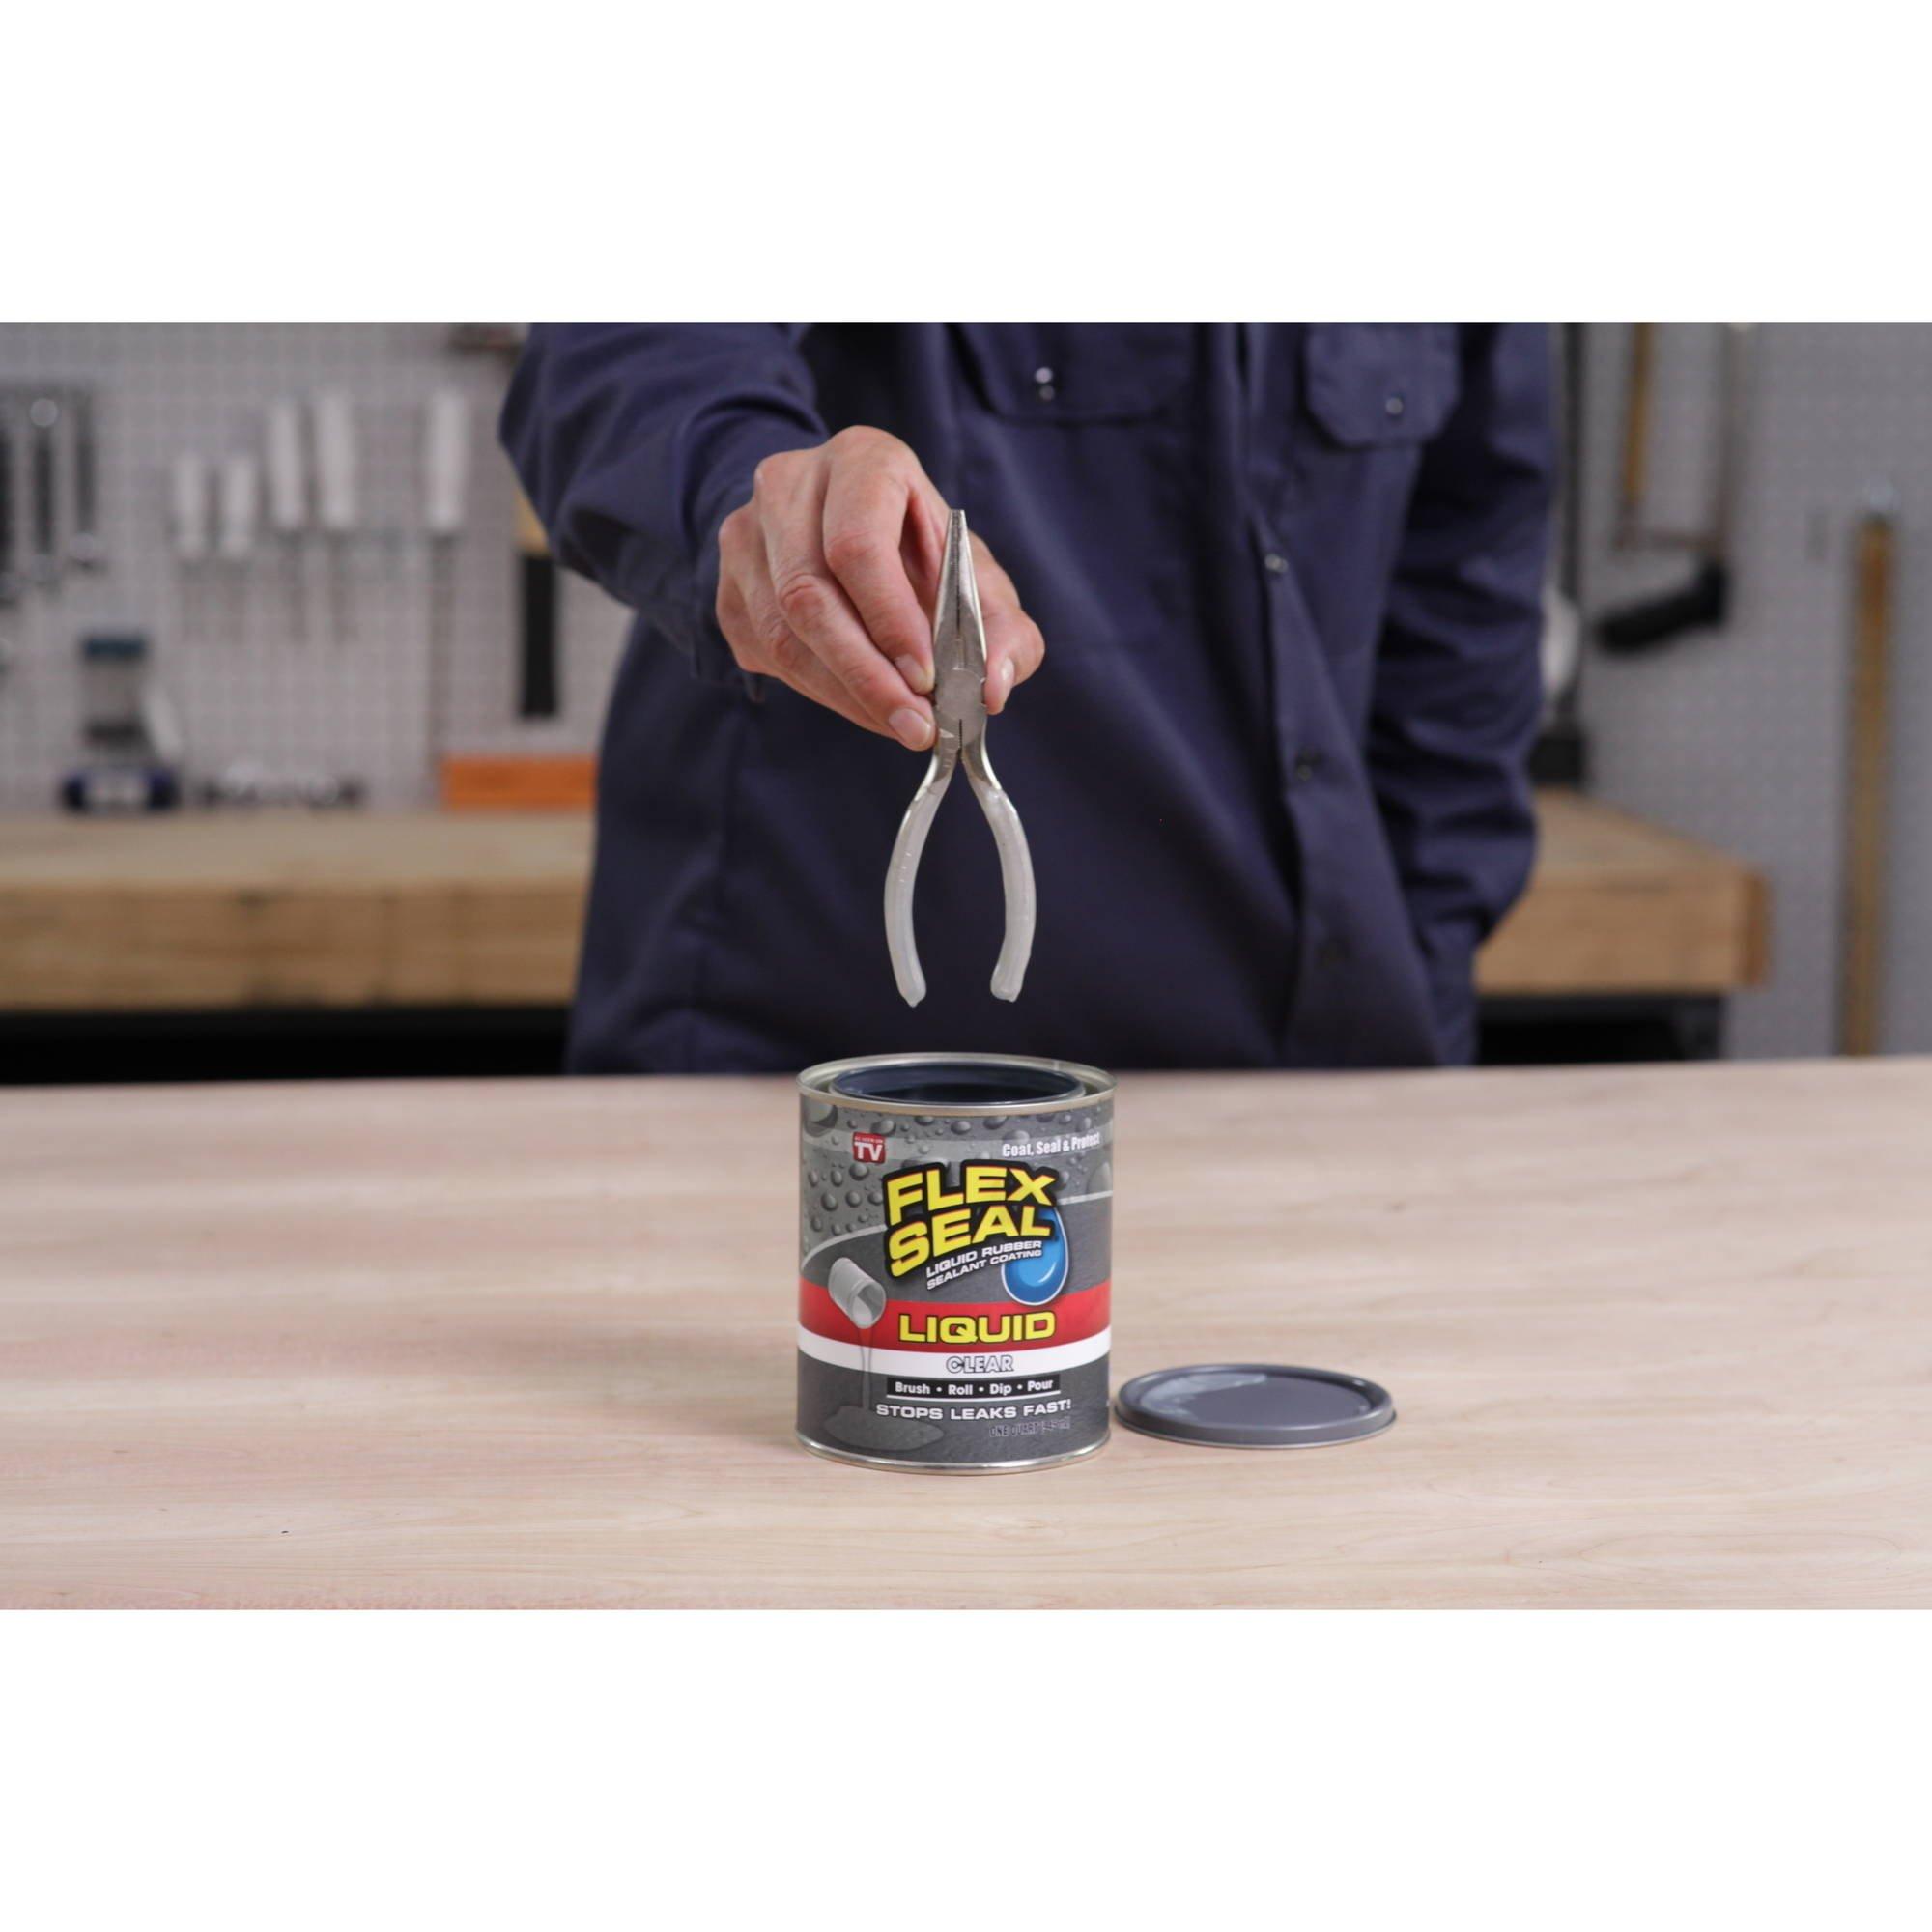 Flex Seal Liquid Rubber in a Can, 1-Gal, Clear by Flex Seal Liquid (Image #4)